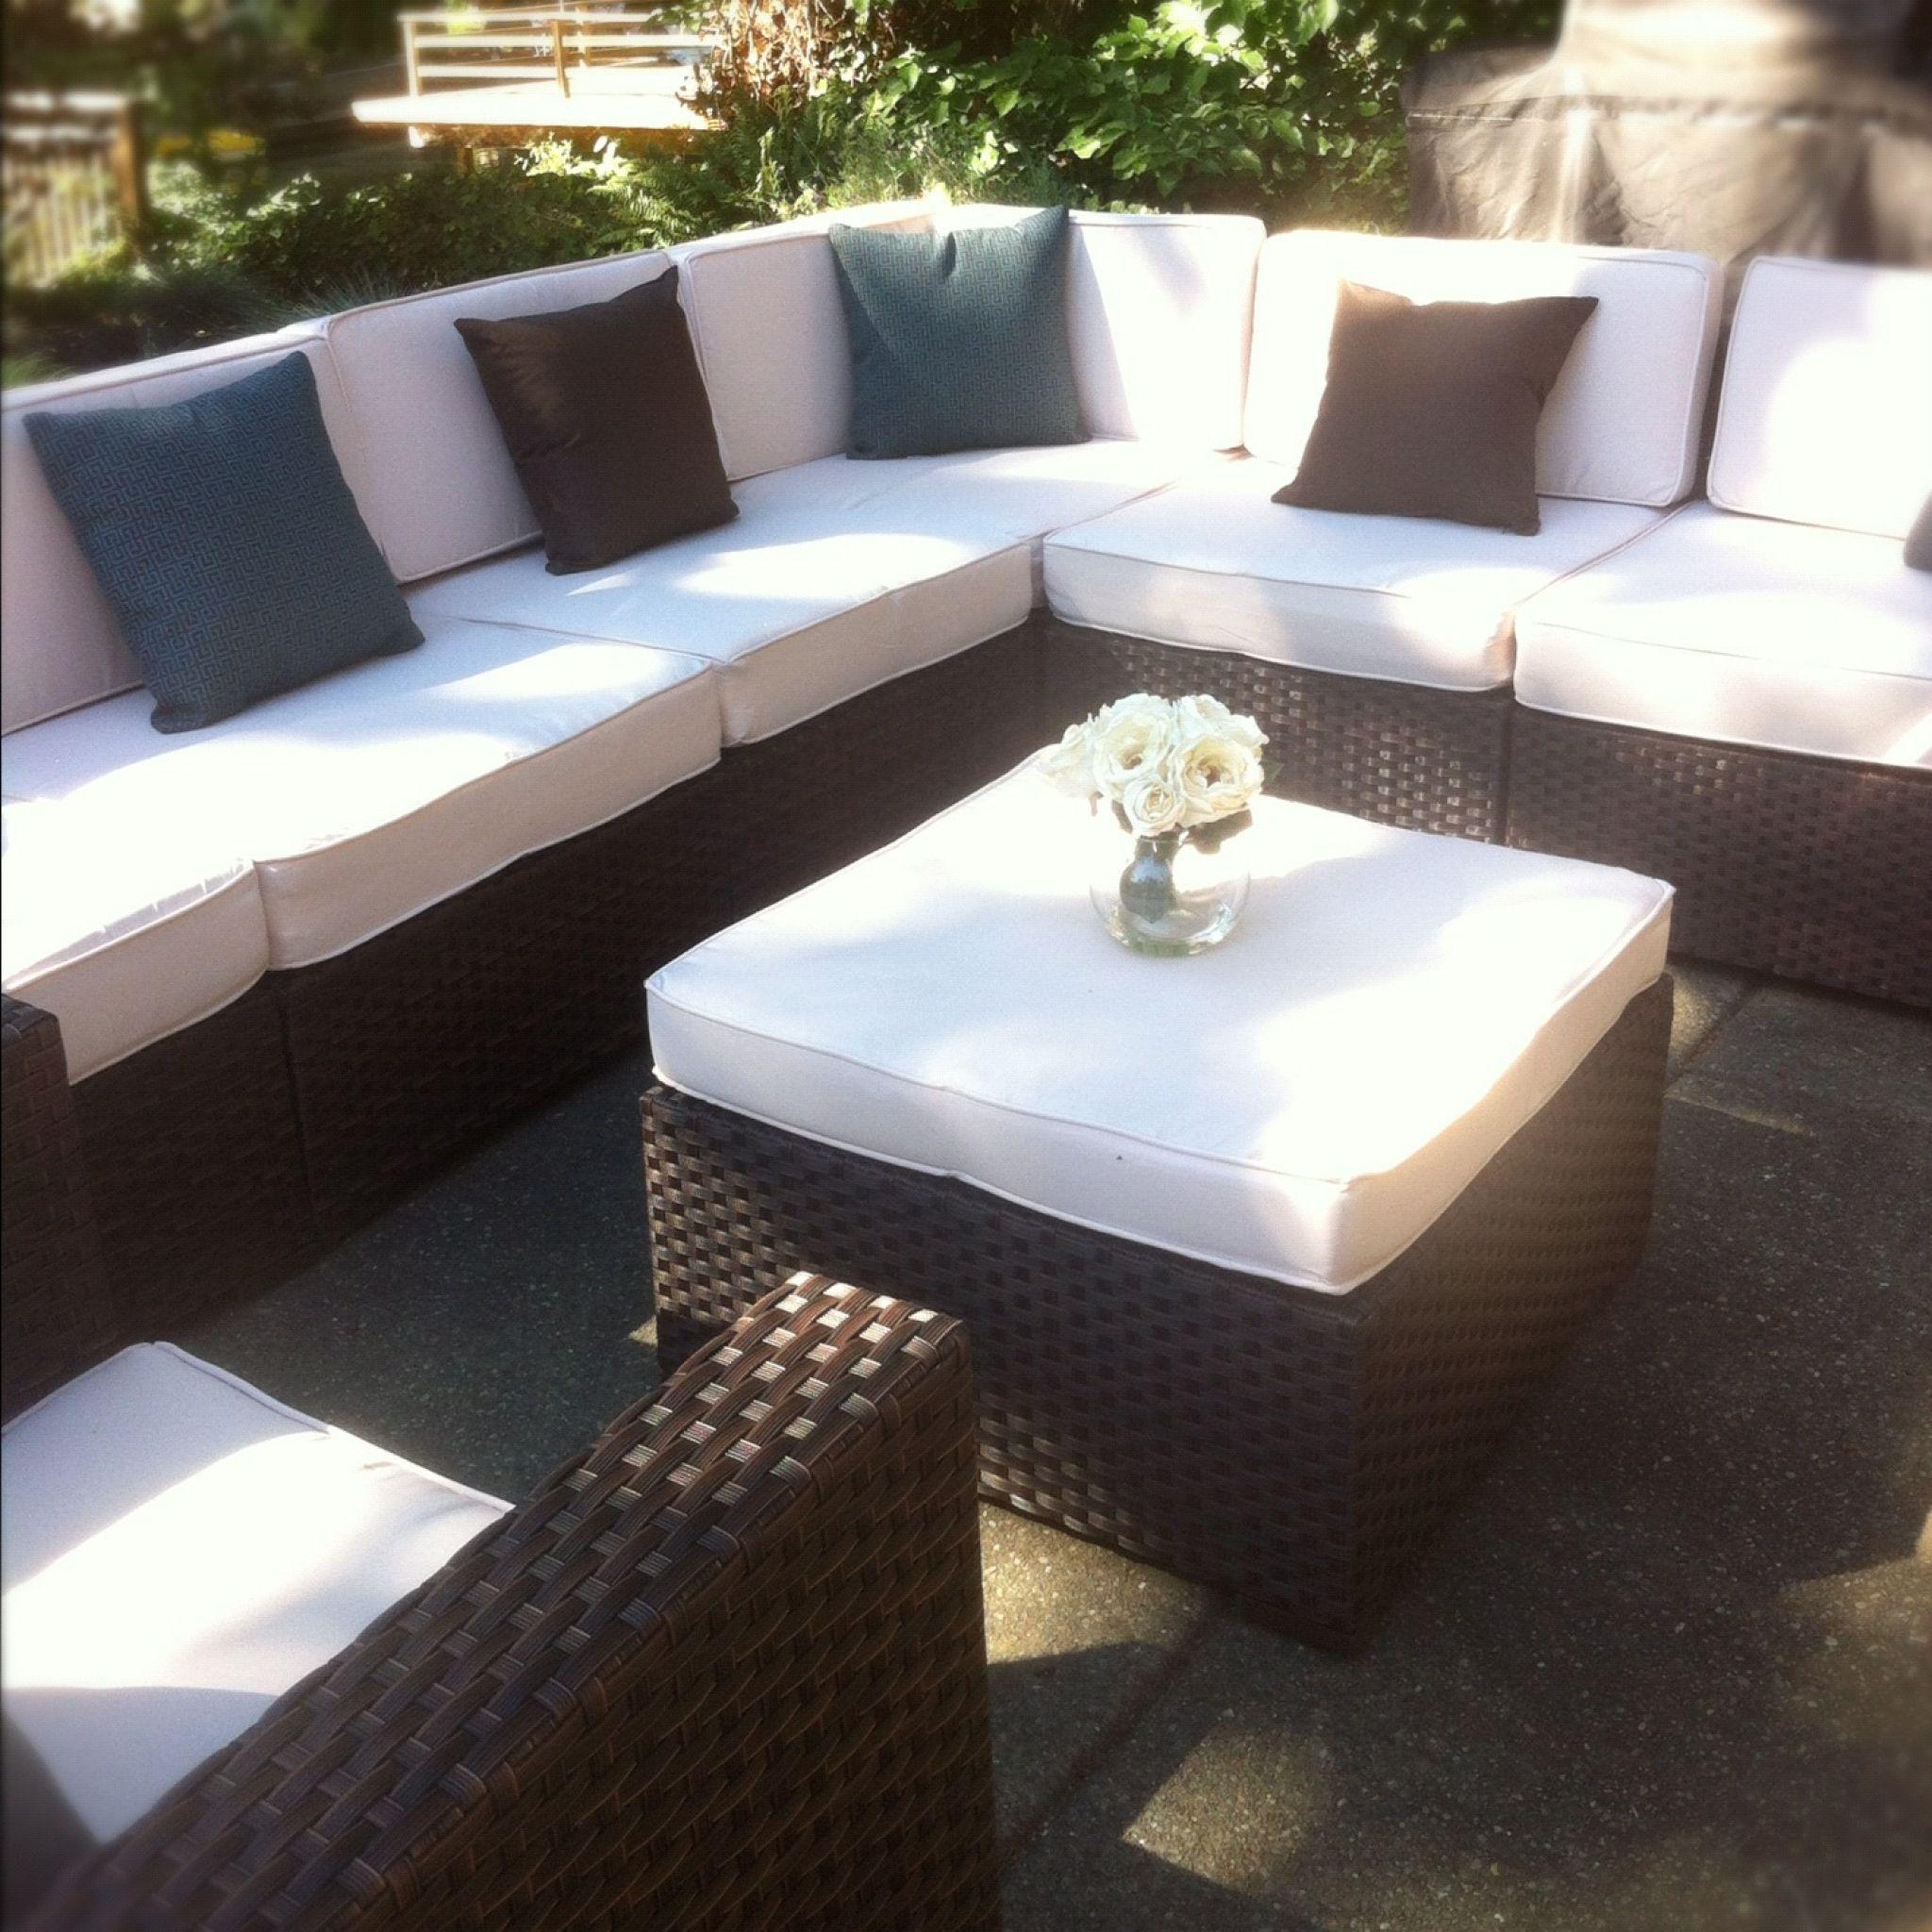 costco outdoor patio furniture most popular interior paint